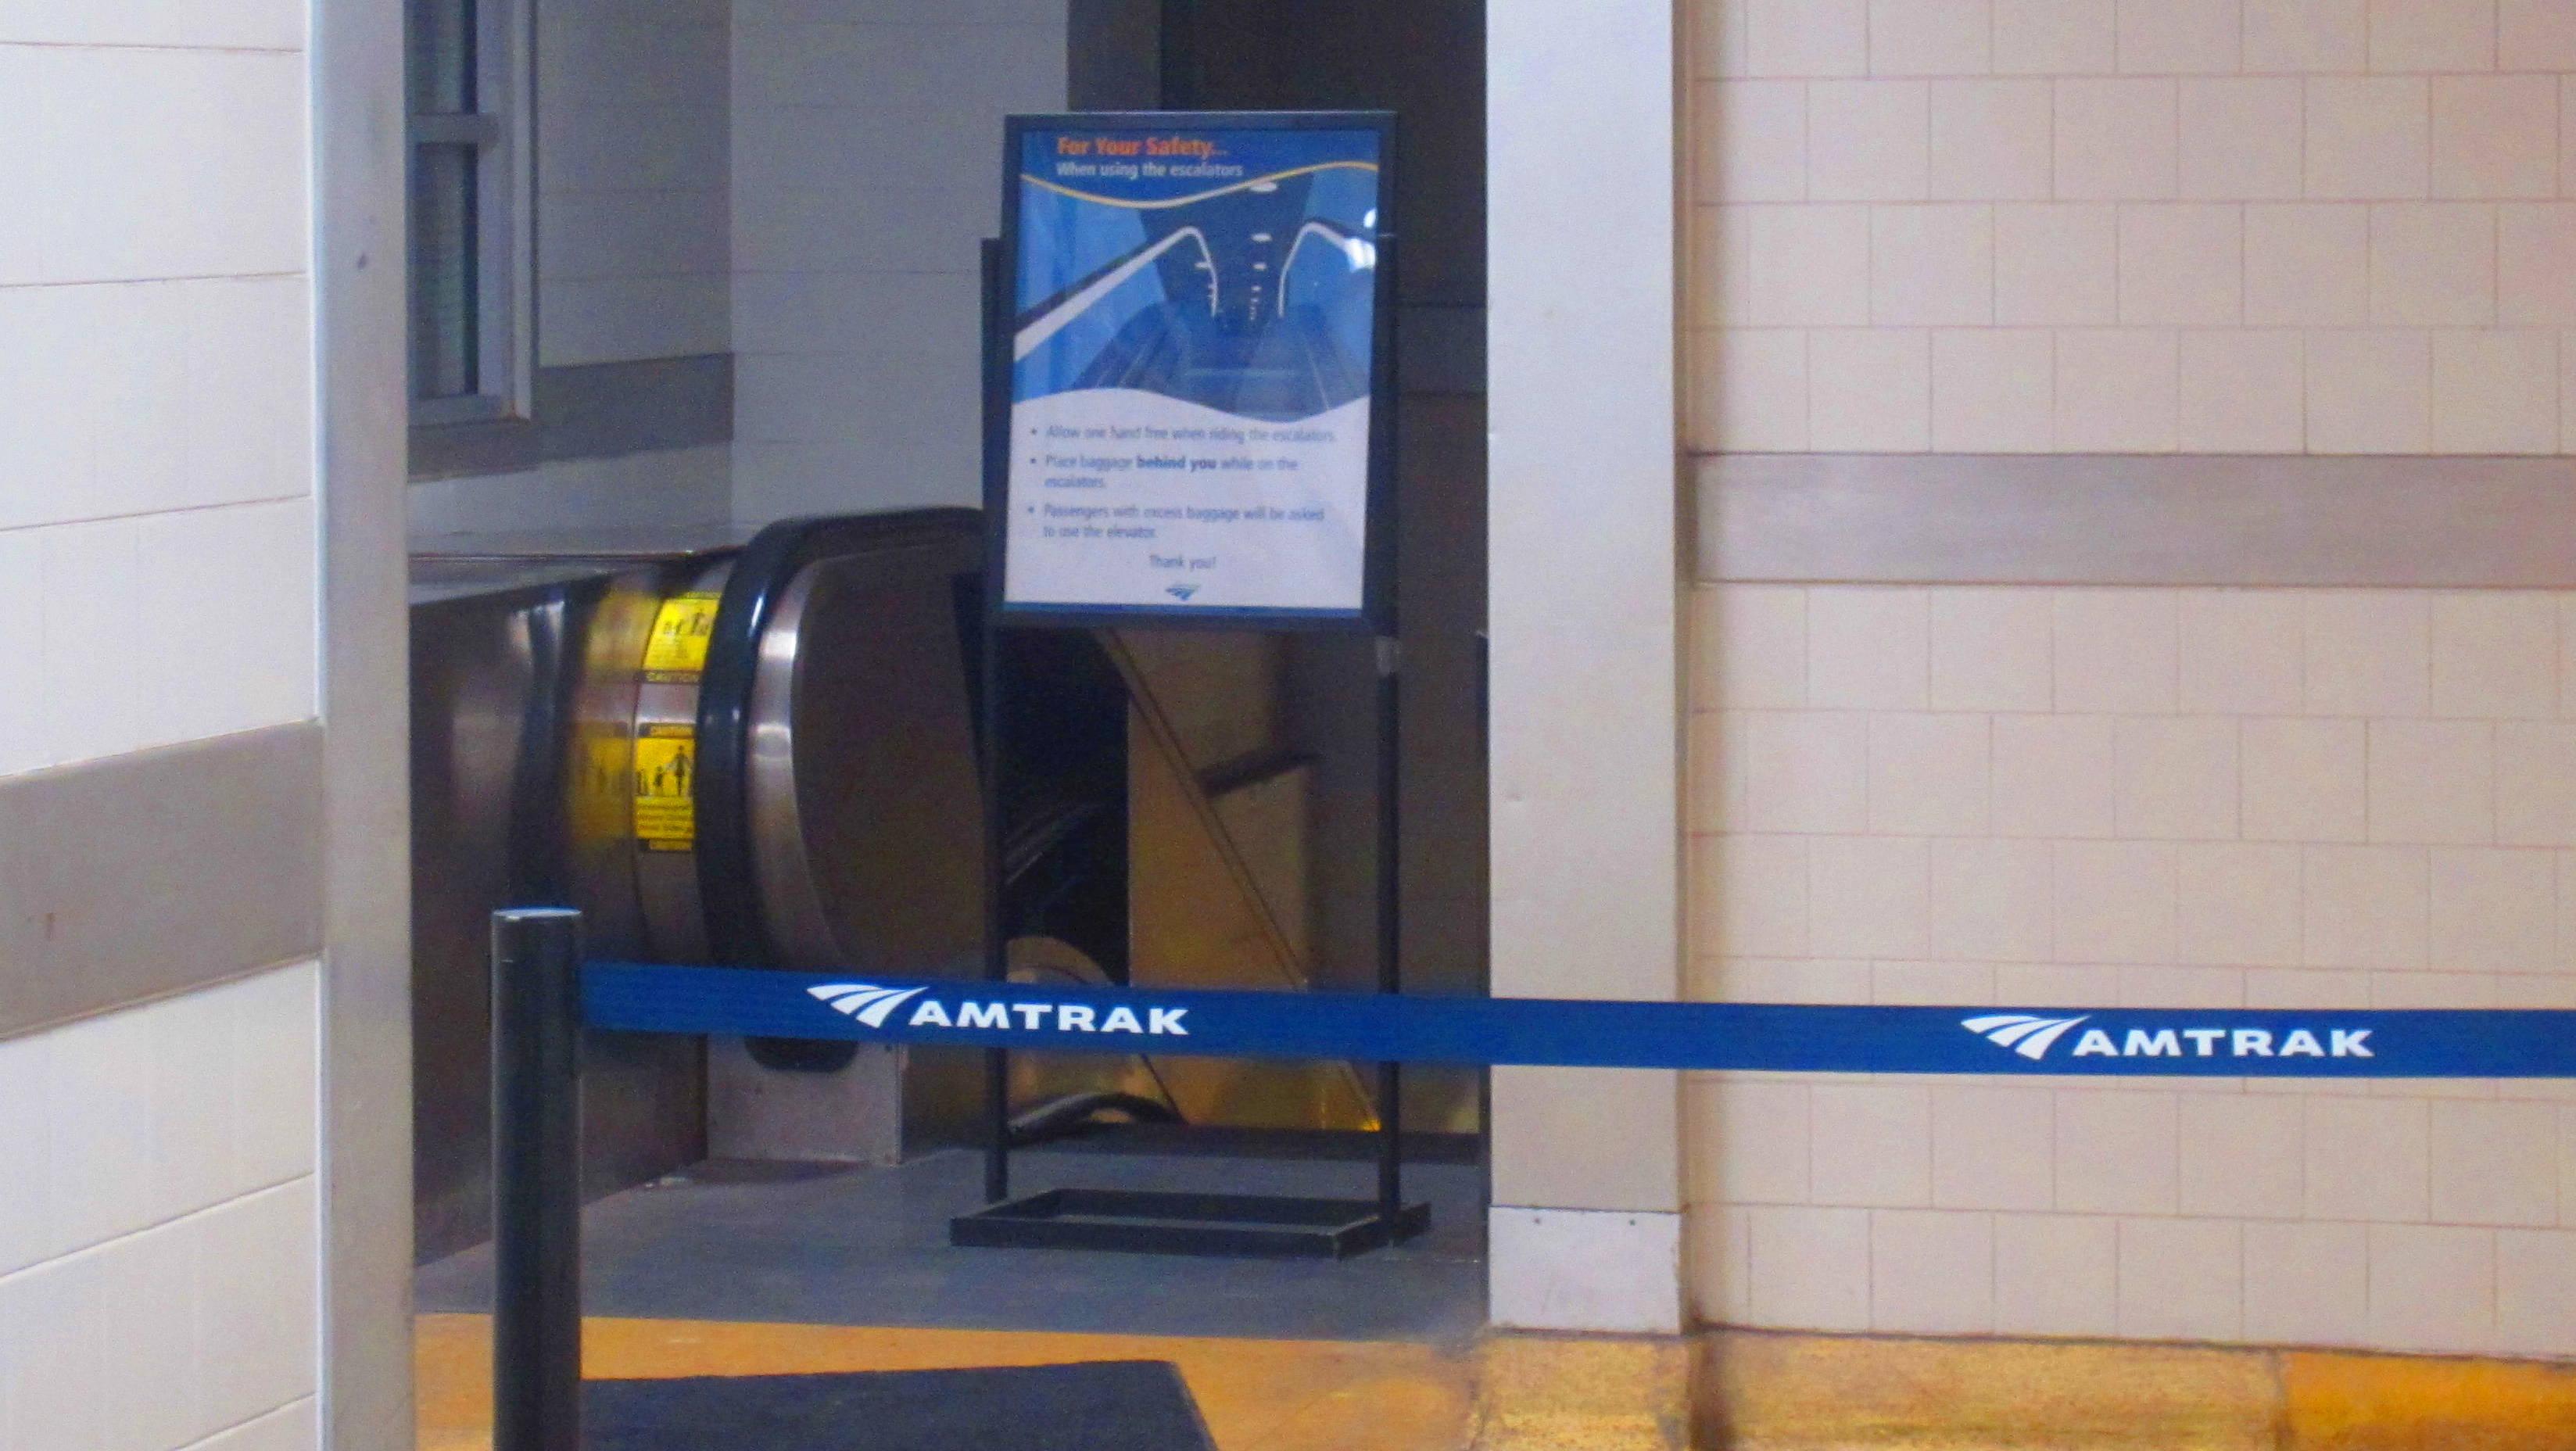 The blocked-off Penn Station escalator, viewed from the lobby level. (Scott Klinger)